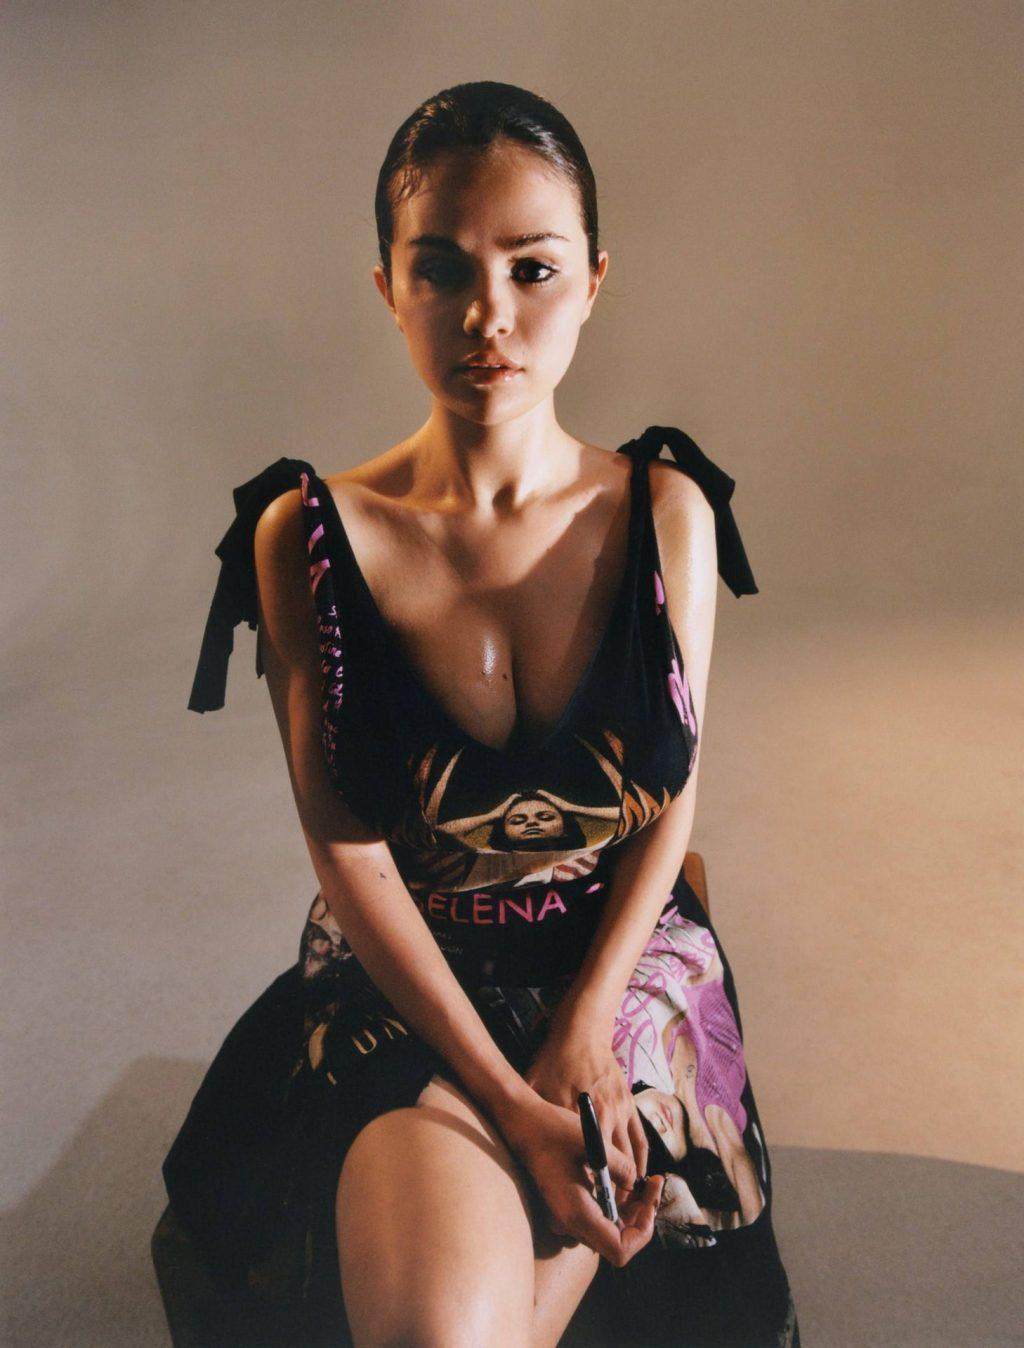 Selena Gomez Shows Her Body in a Photoshoot for Dazed Magazine (35 Photos)